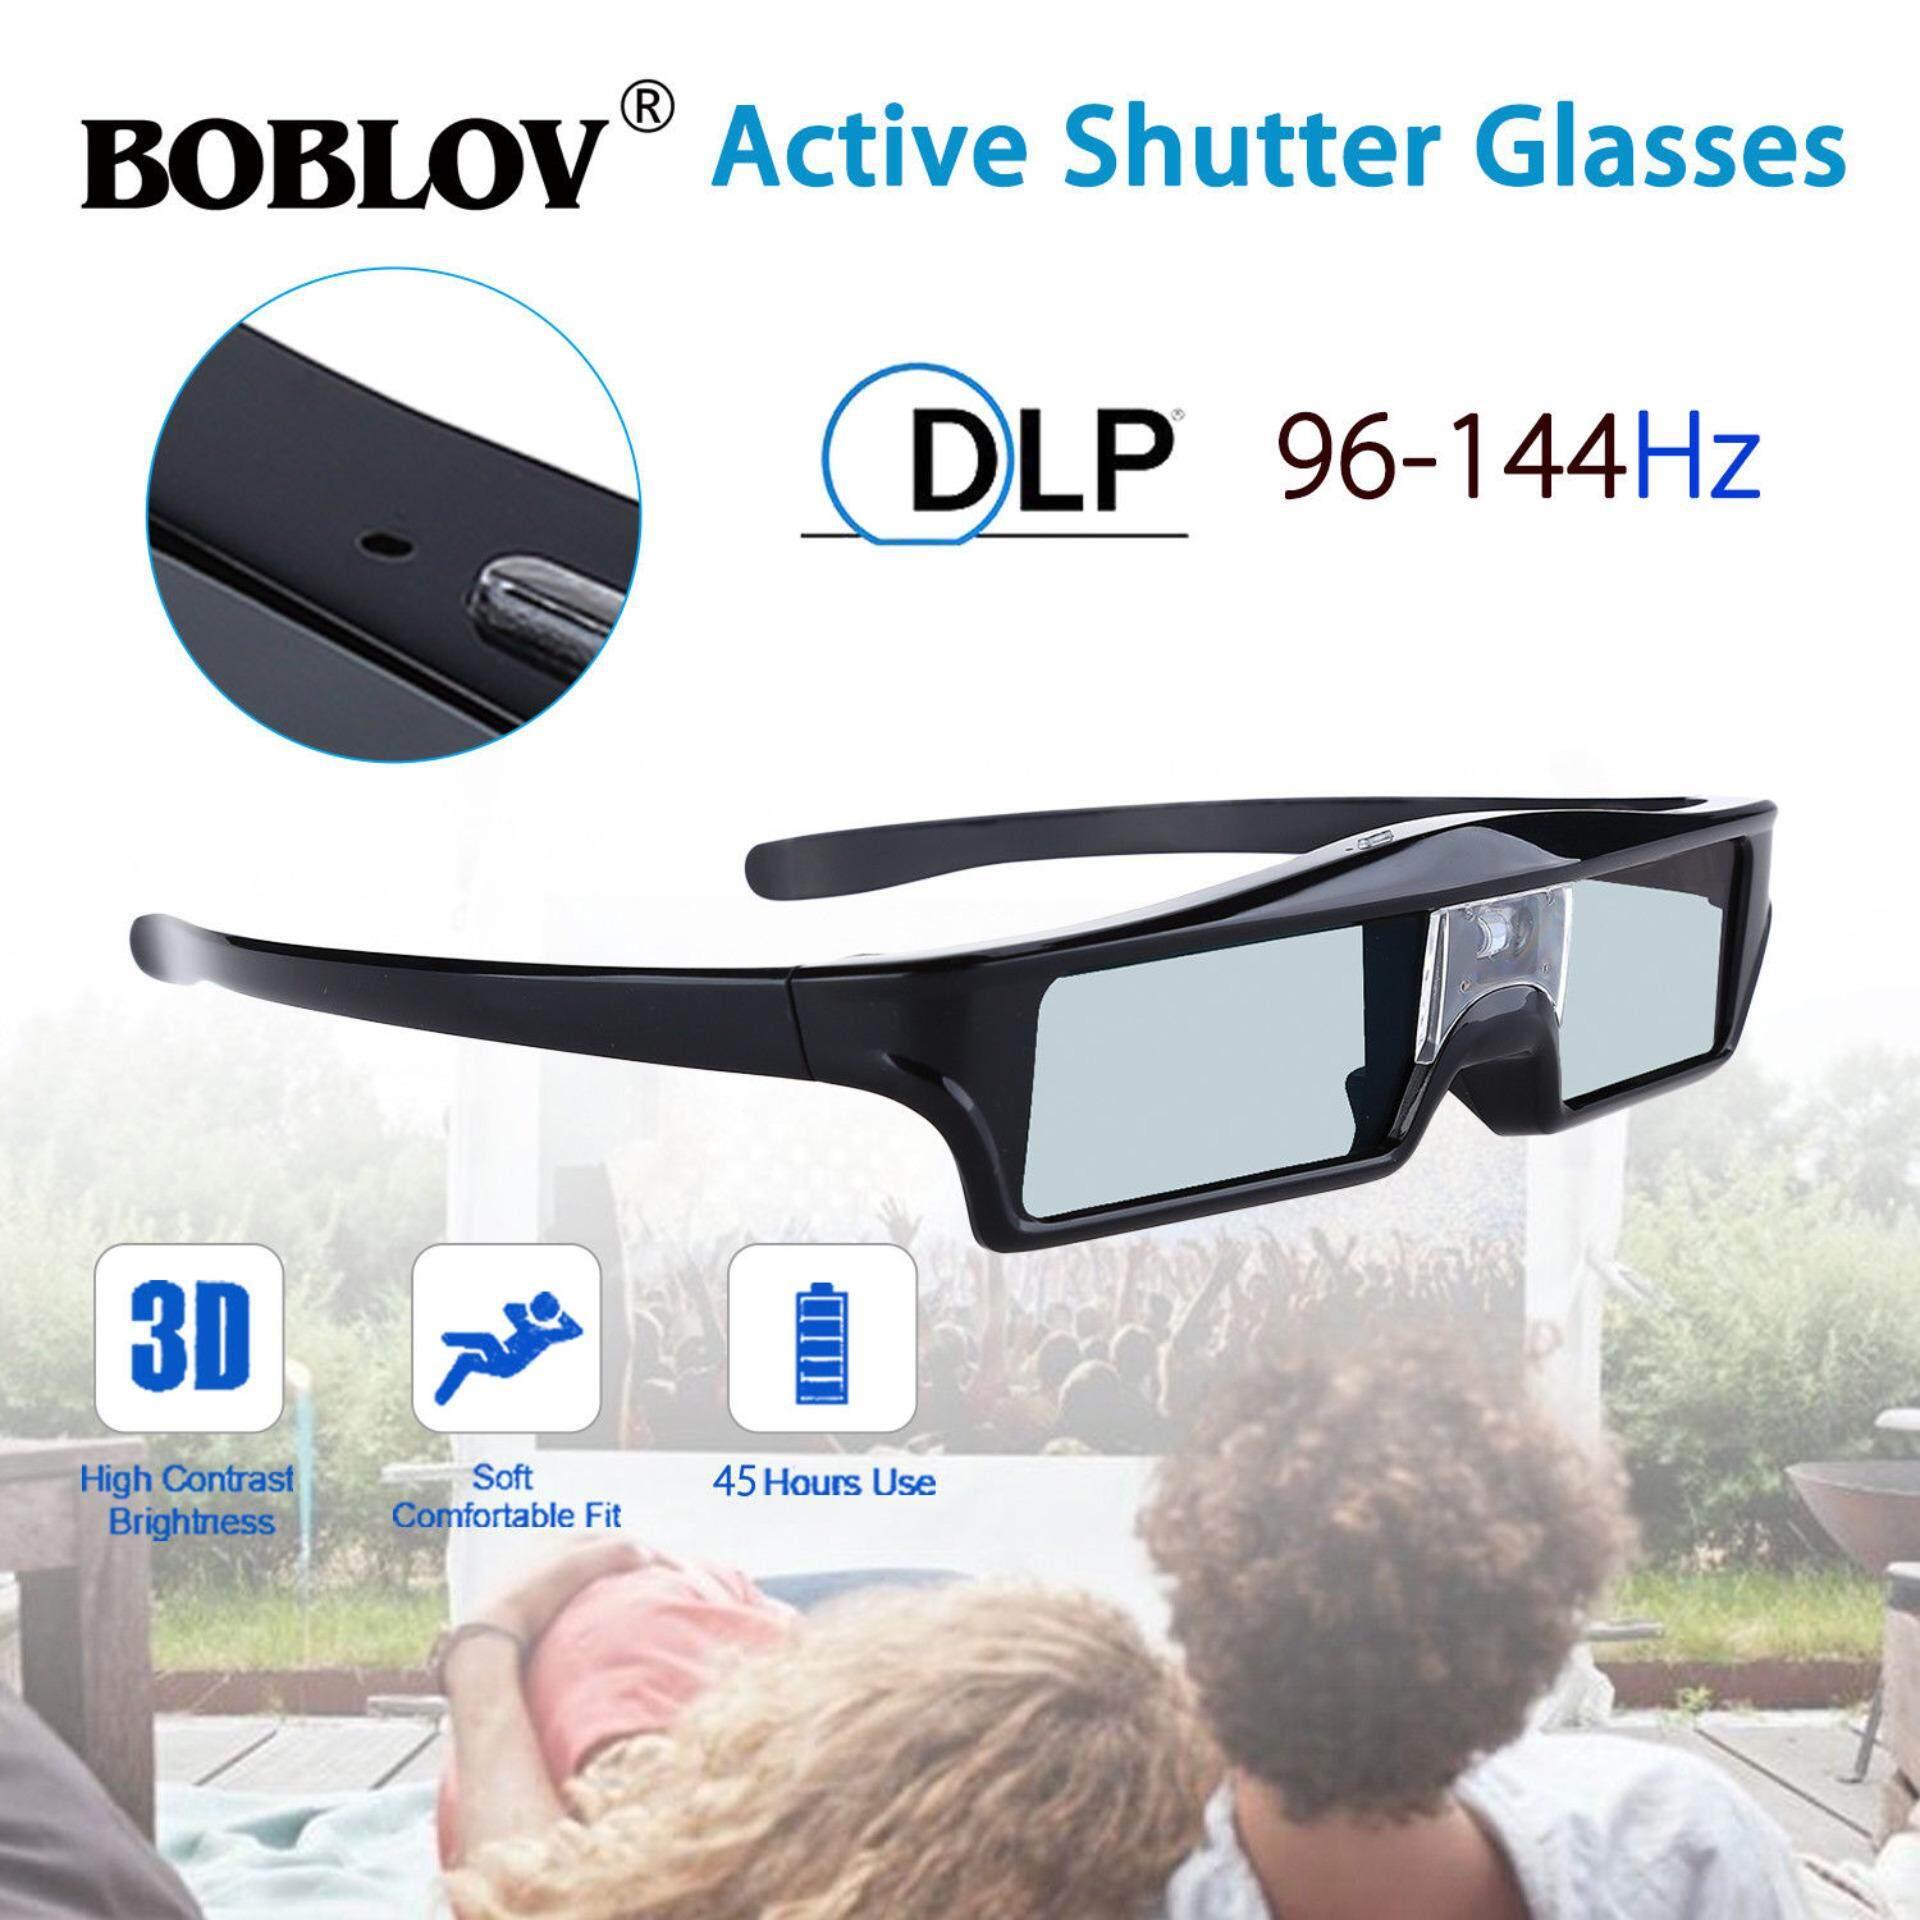 Beautiy Kota 3D Rana Kacamata Kacamata 144 HZ Dukungan USB untuk Dlp-link Teknologi Proyektor-Internasional